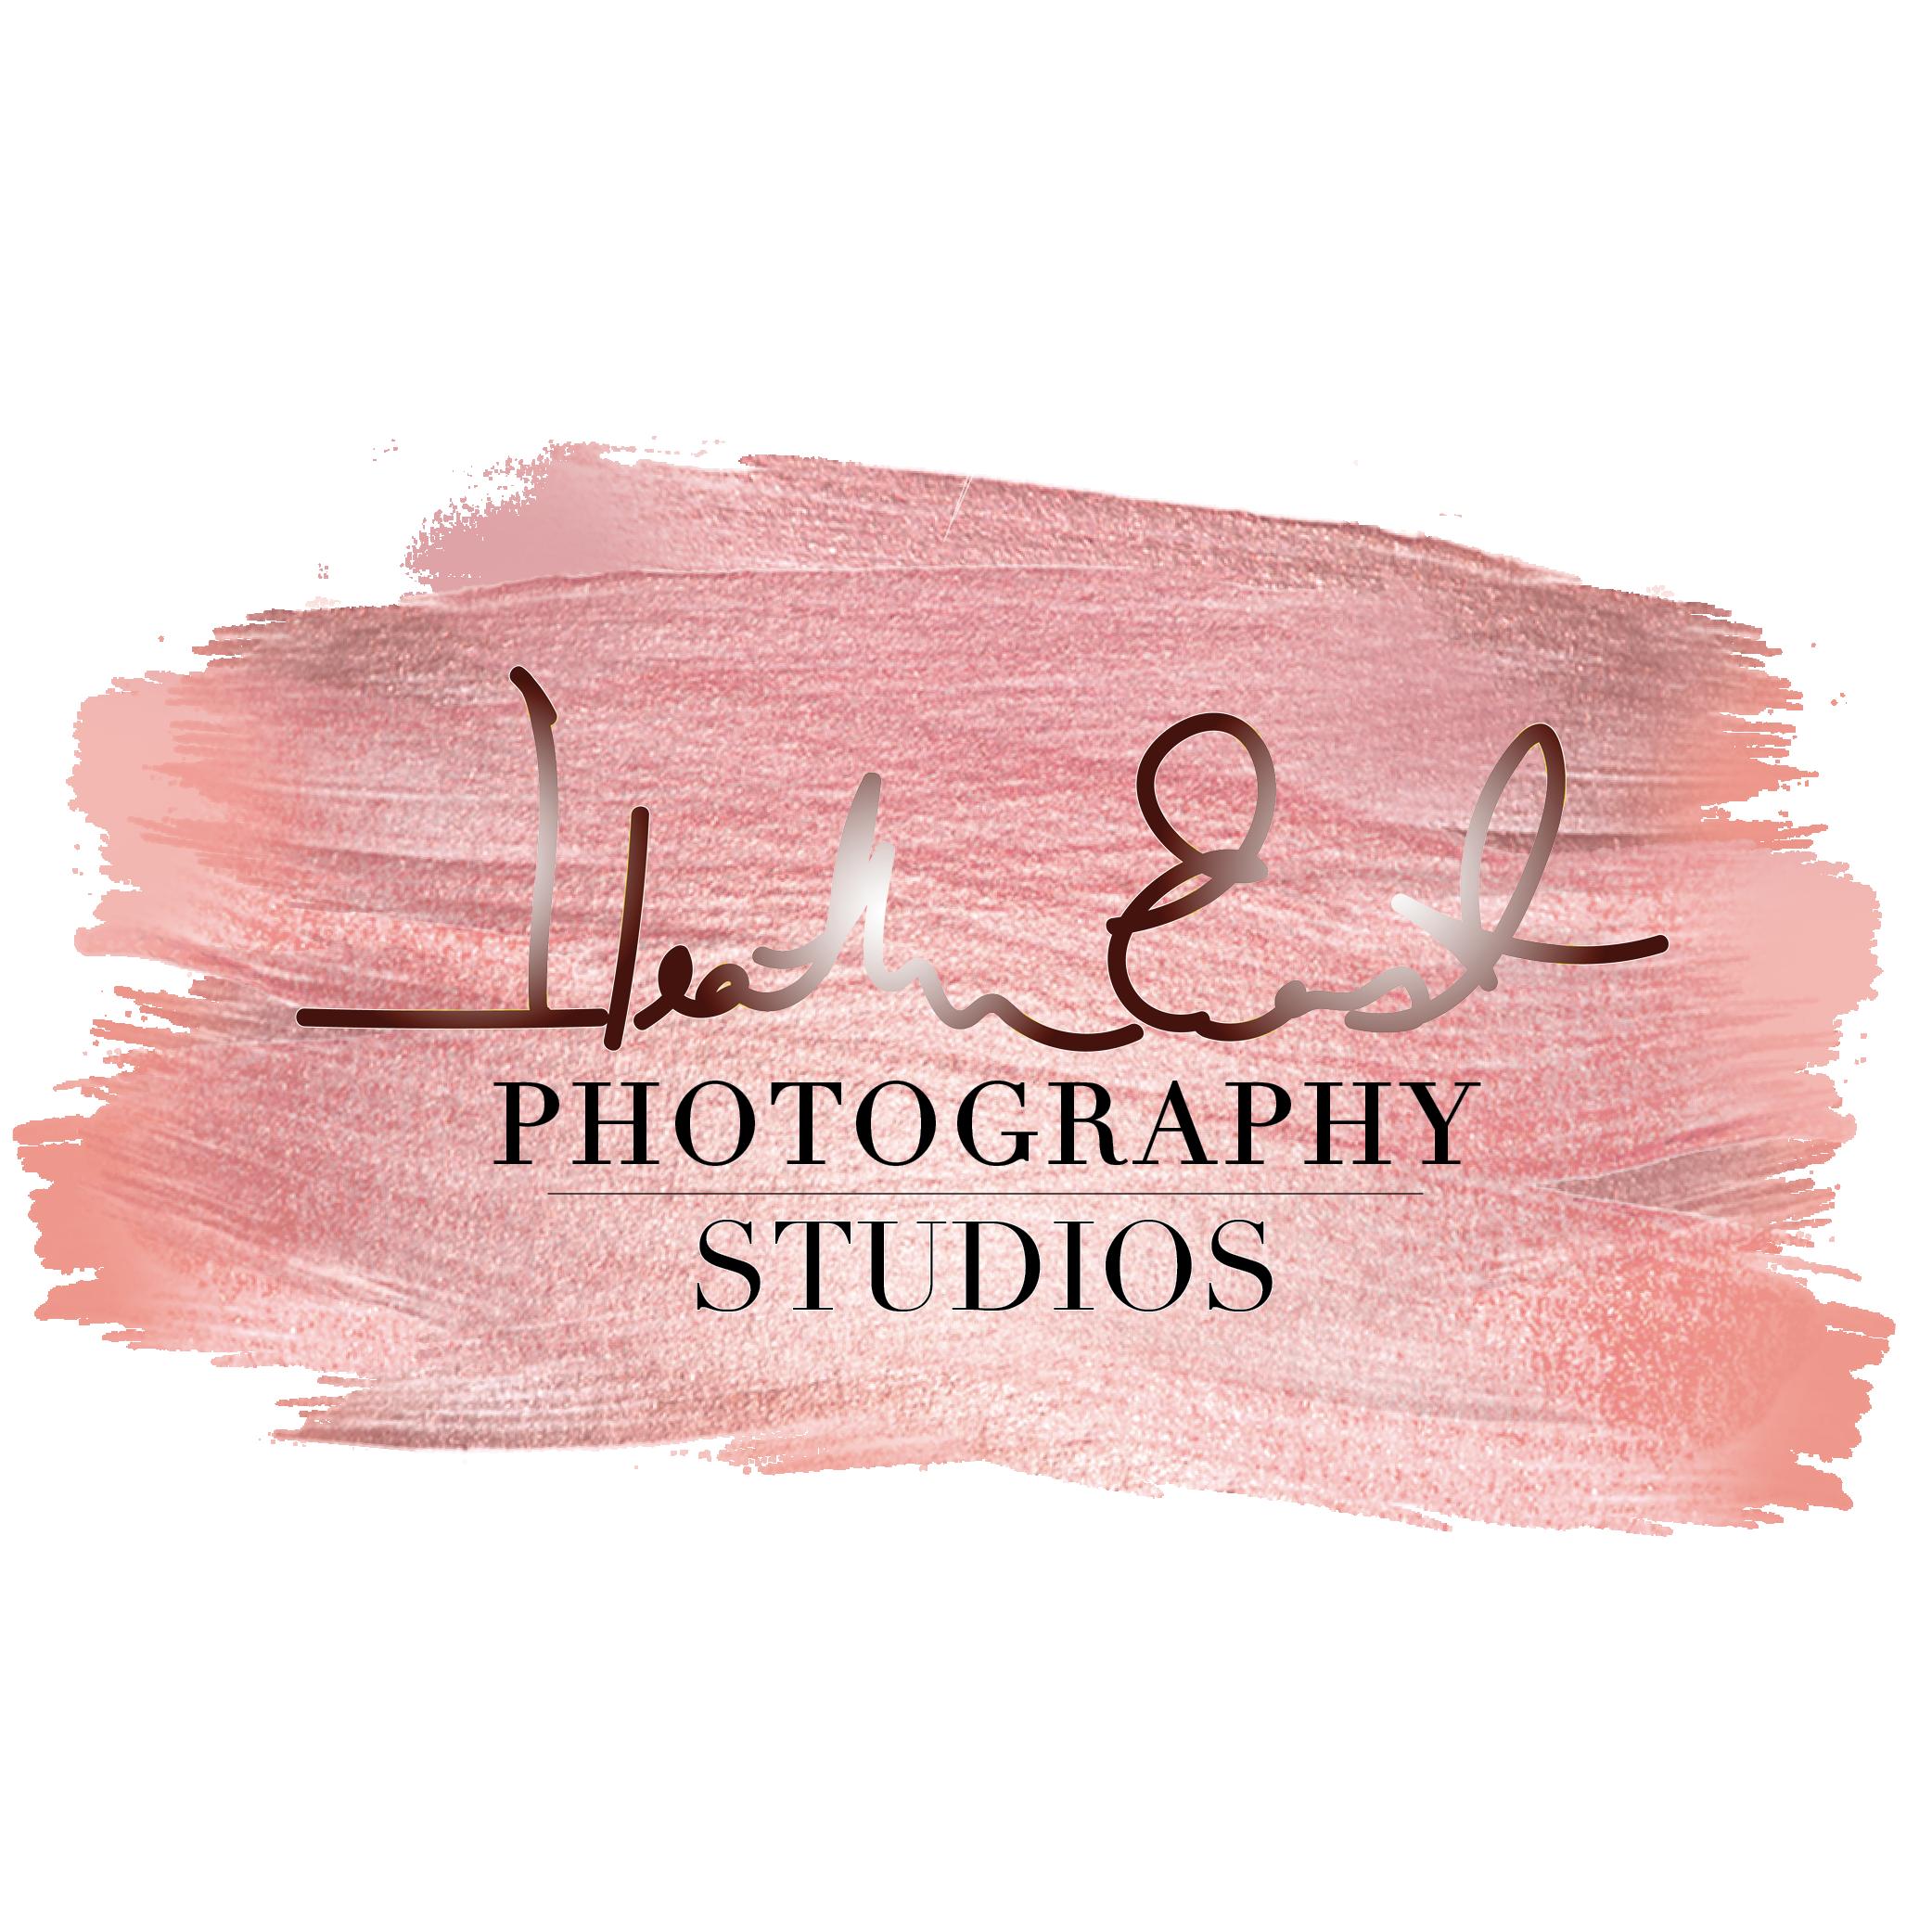 H. E. Studios - WEDDINGS | ENGAGEMENT | NEWBORN  | FAMILY | BOUDOIR